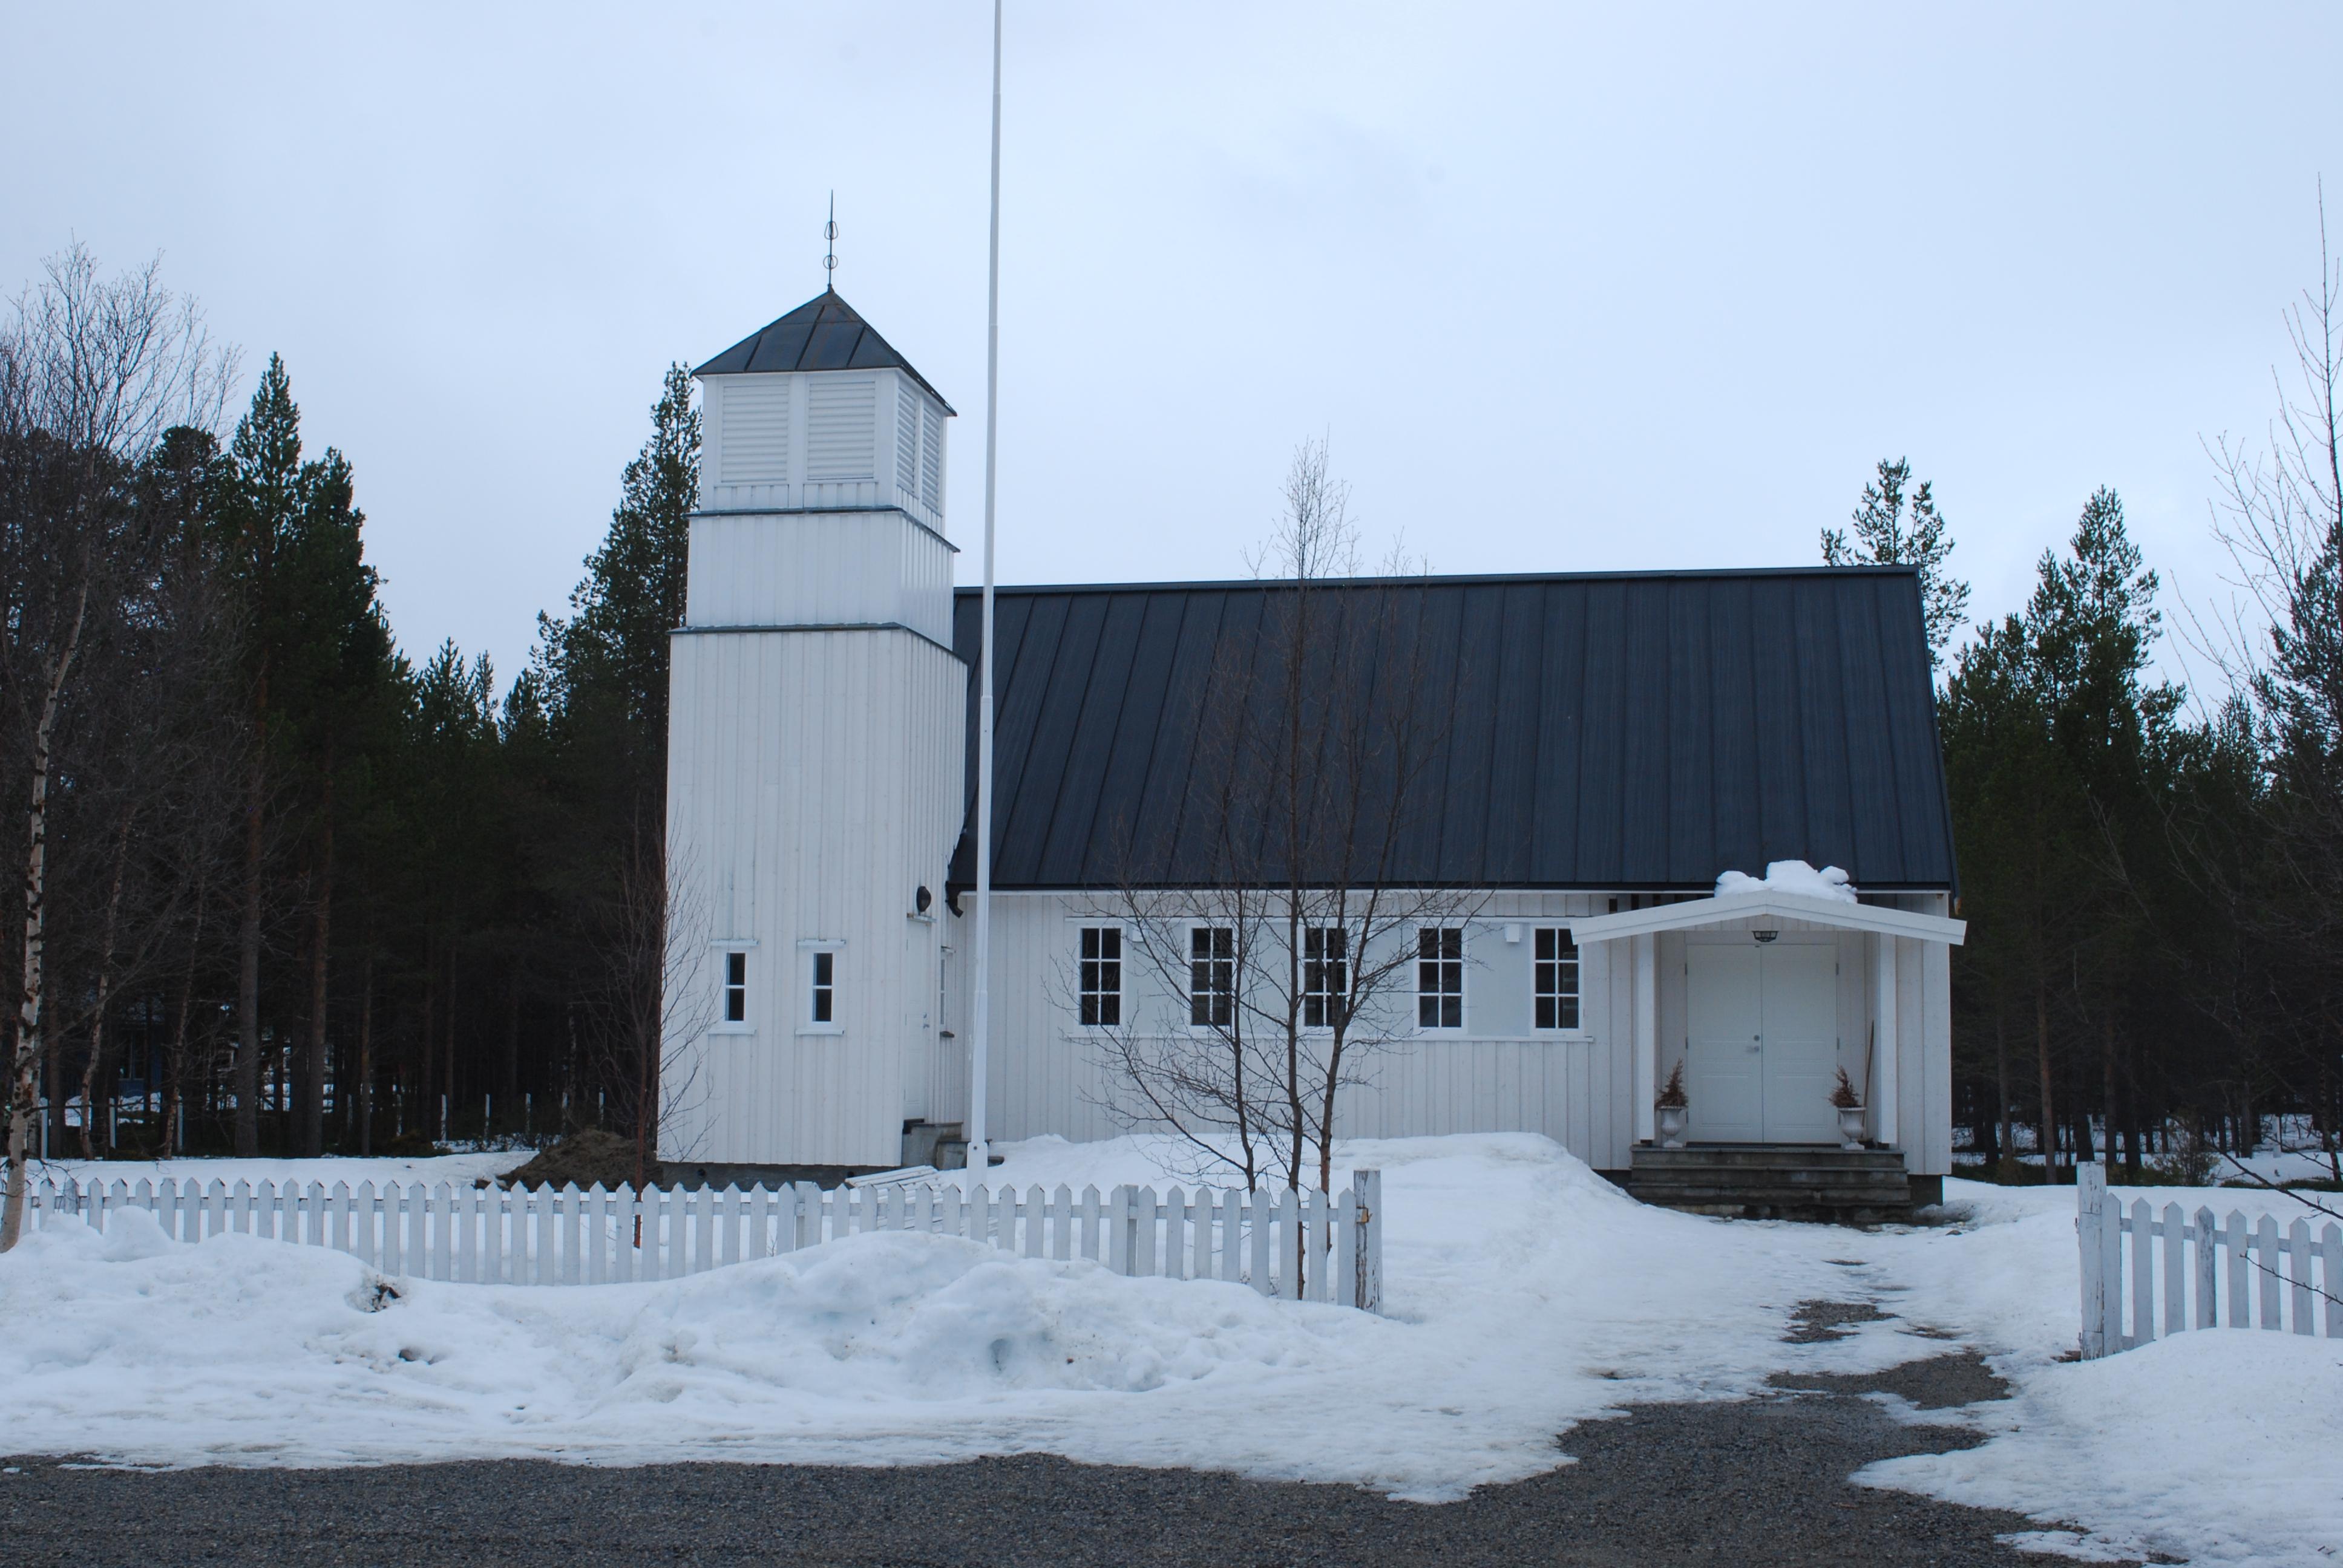 Skoganvarre kapell